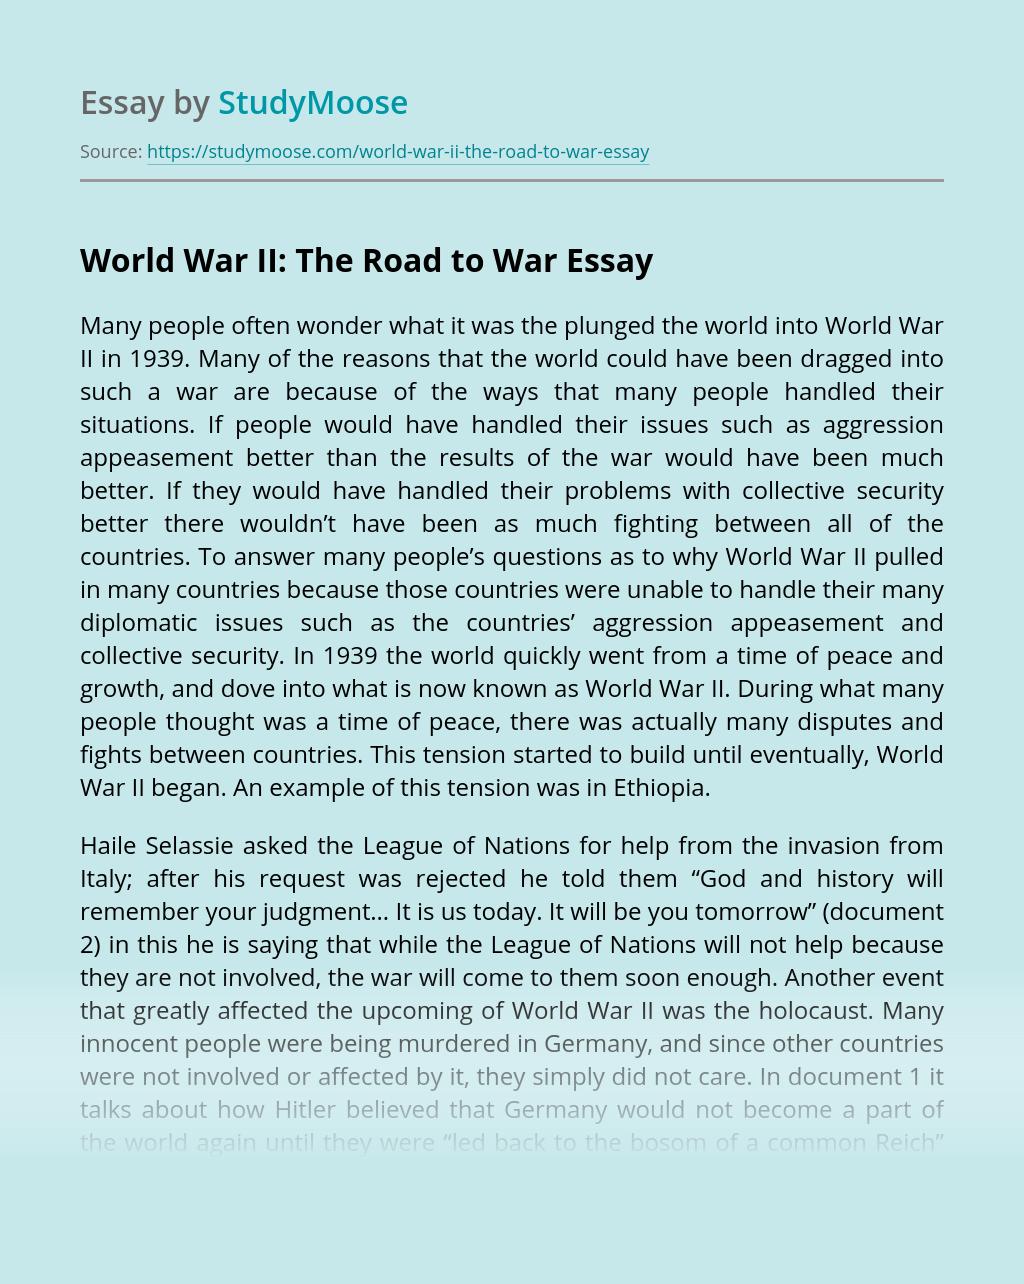 World War II: The Road to War